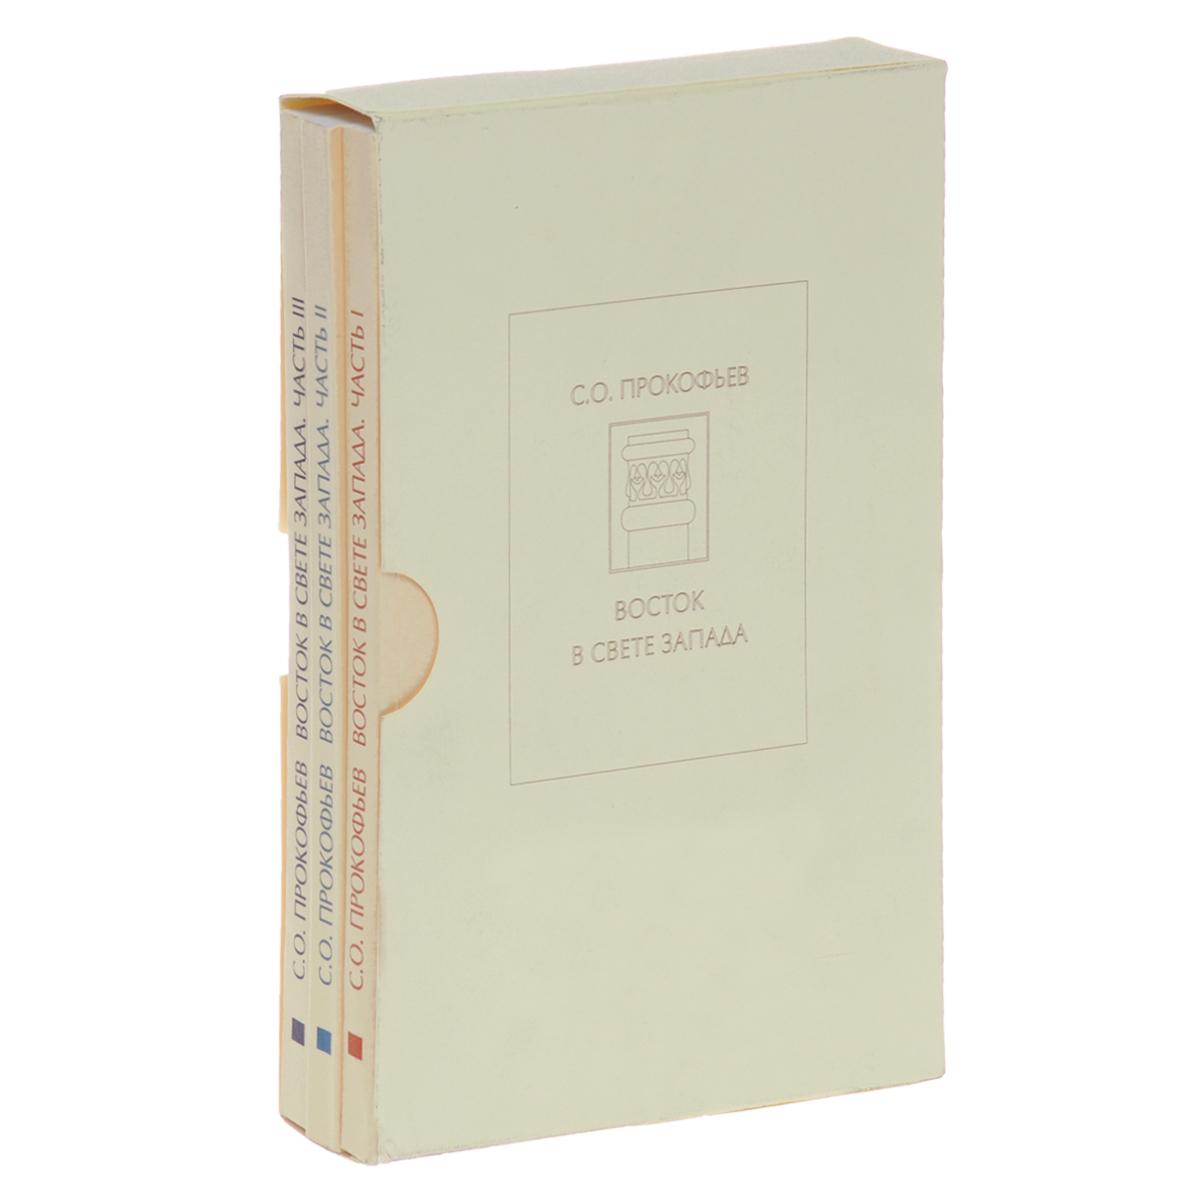 Восток в свете Запада (комплект из 3 книг)